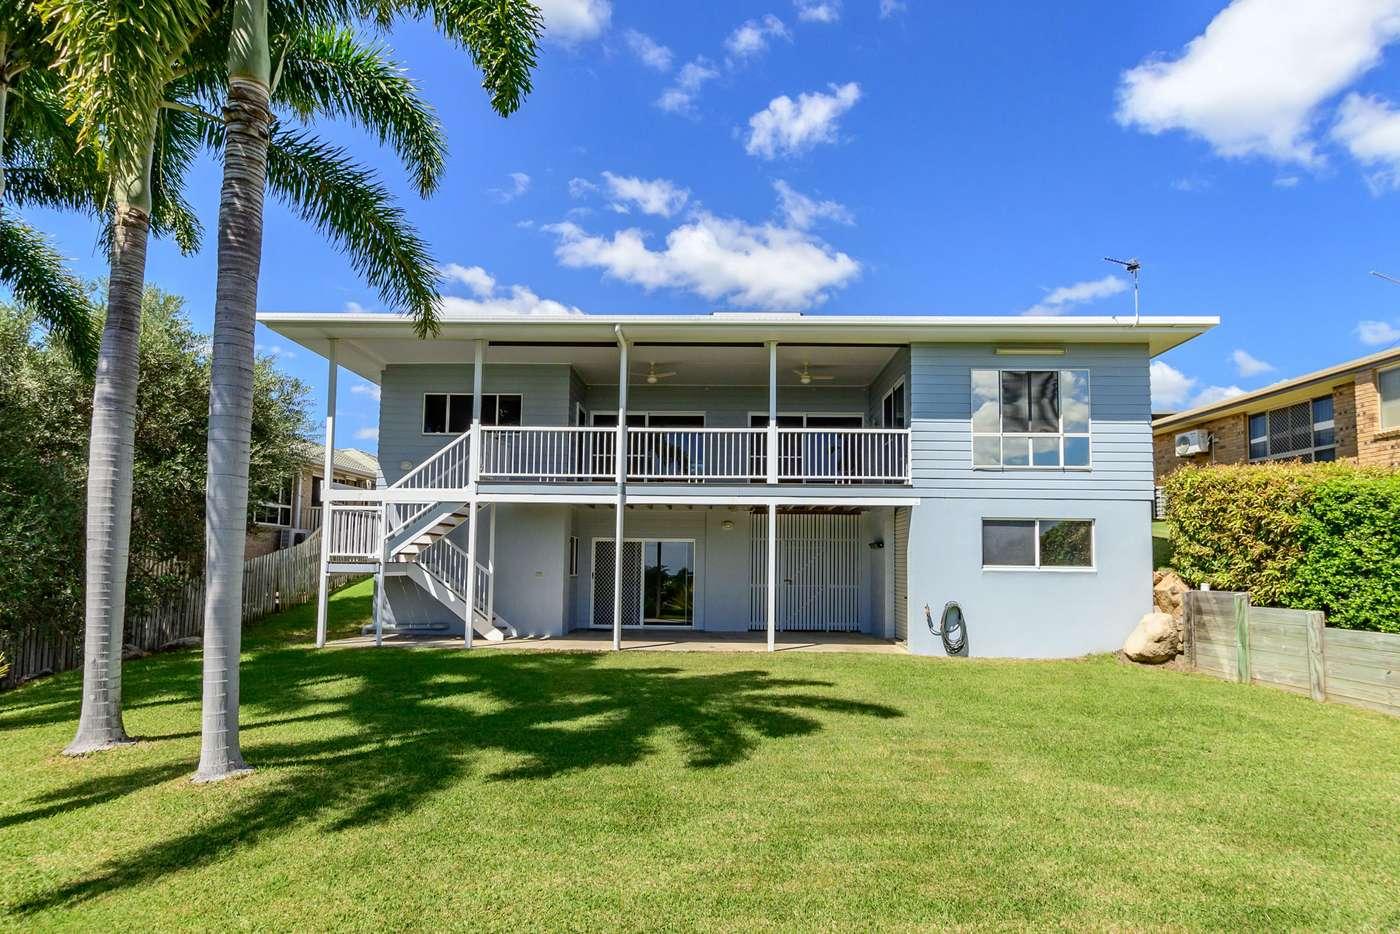 Main view of Homely house listing, 22 Magnolia Avenue, Kin Kora QLD 4680